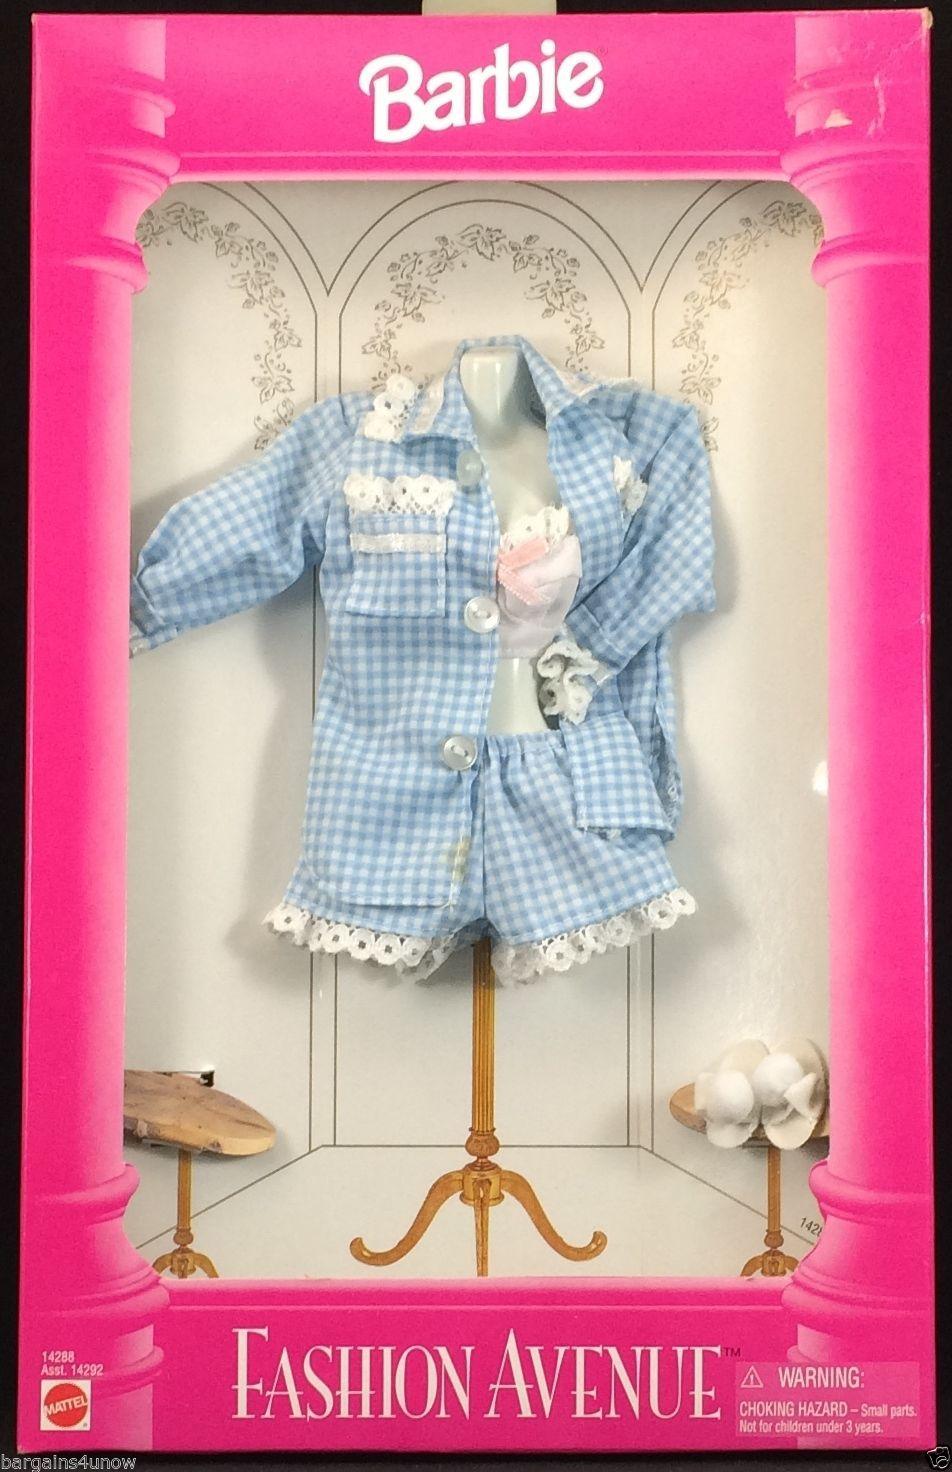 Barbie Fashion Avenue Blue Gingham Pajama Shorts Set Accessories Nrfb Fashion Avenue Vintage Barbie Clothes Barbie Fashion